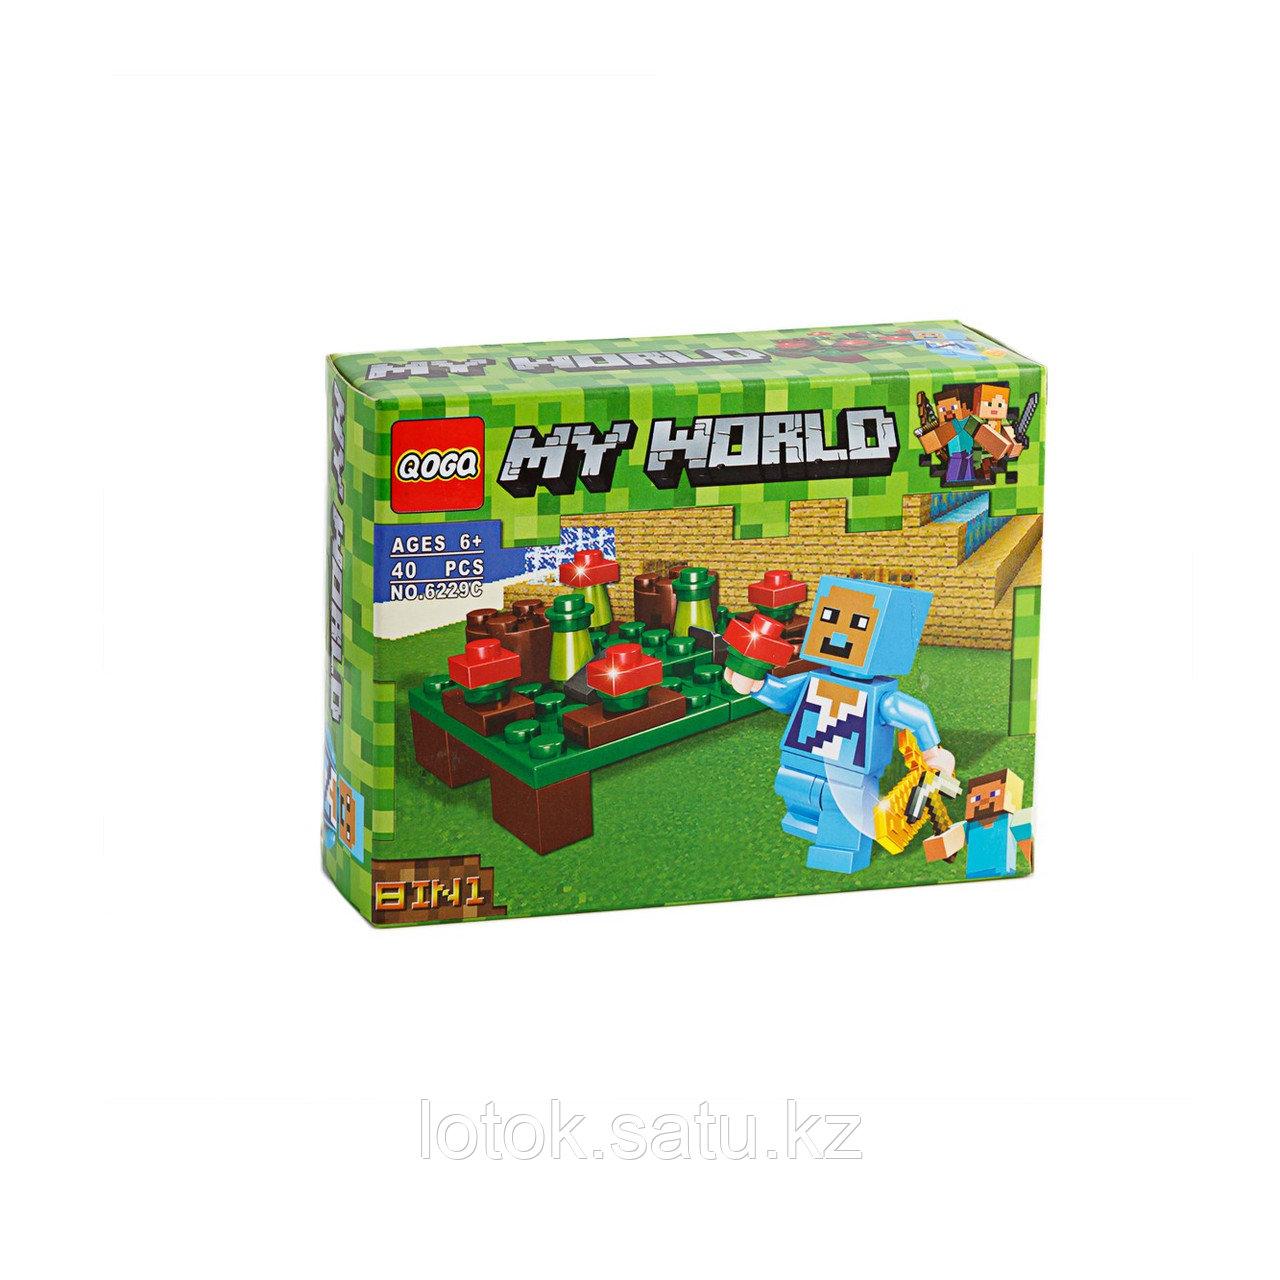 Конструктор My World (Minecraft) 6229А 36 деталей - фото 3